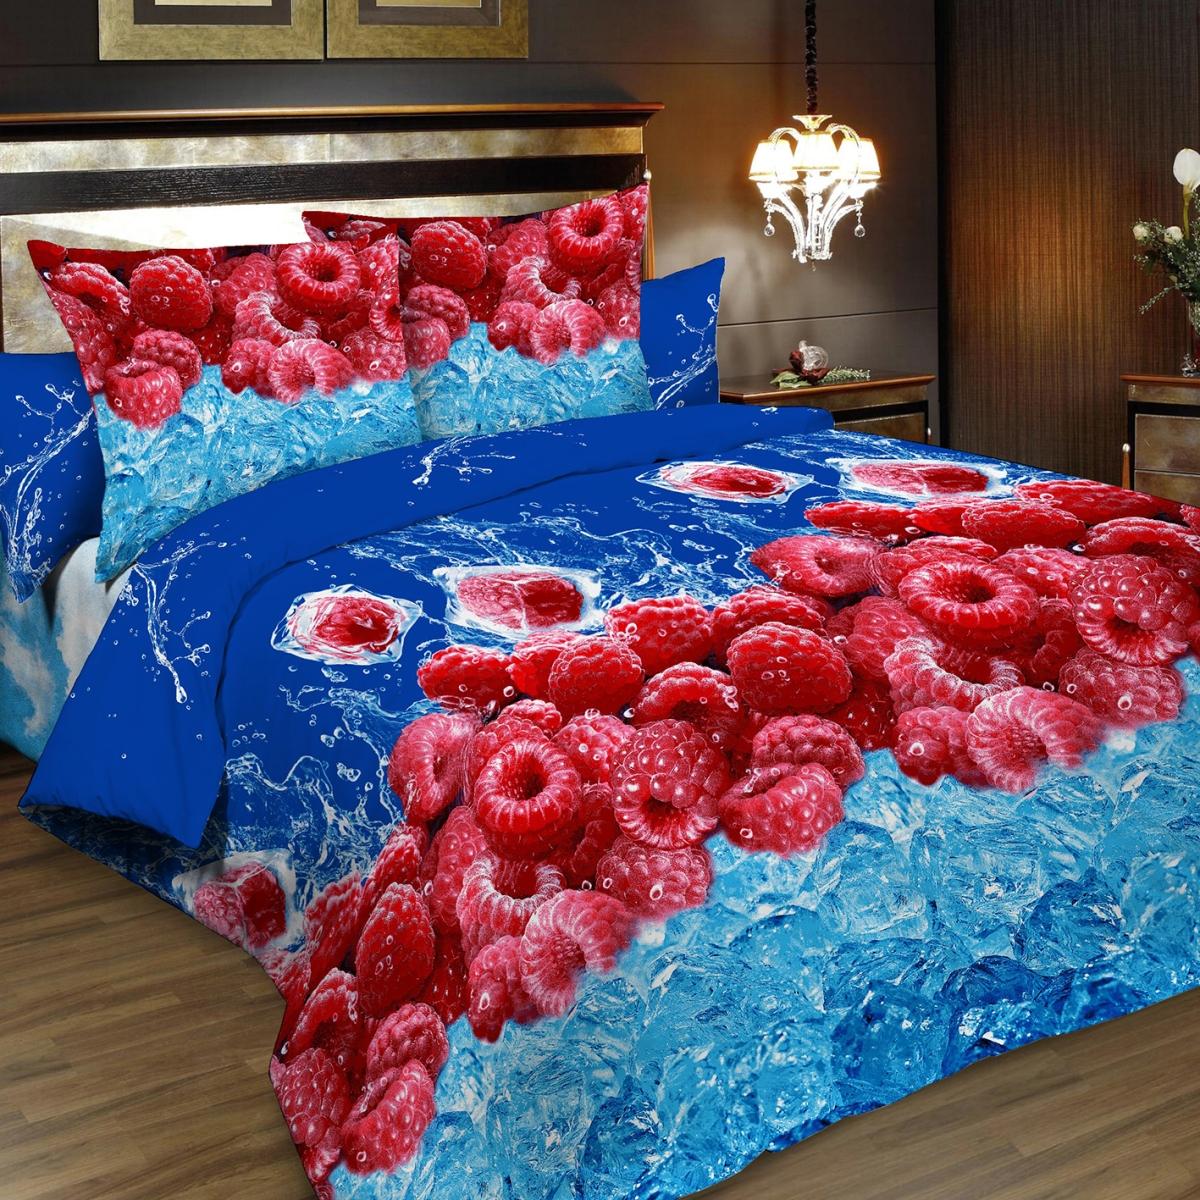 Комплект белья Letto, евро, наволочки 70х70. B185-6 комплект постельного белья michelle home textiles kdbb